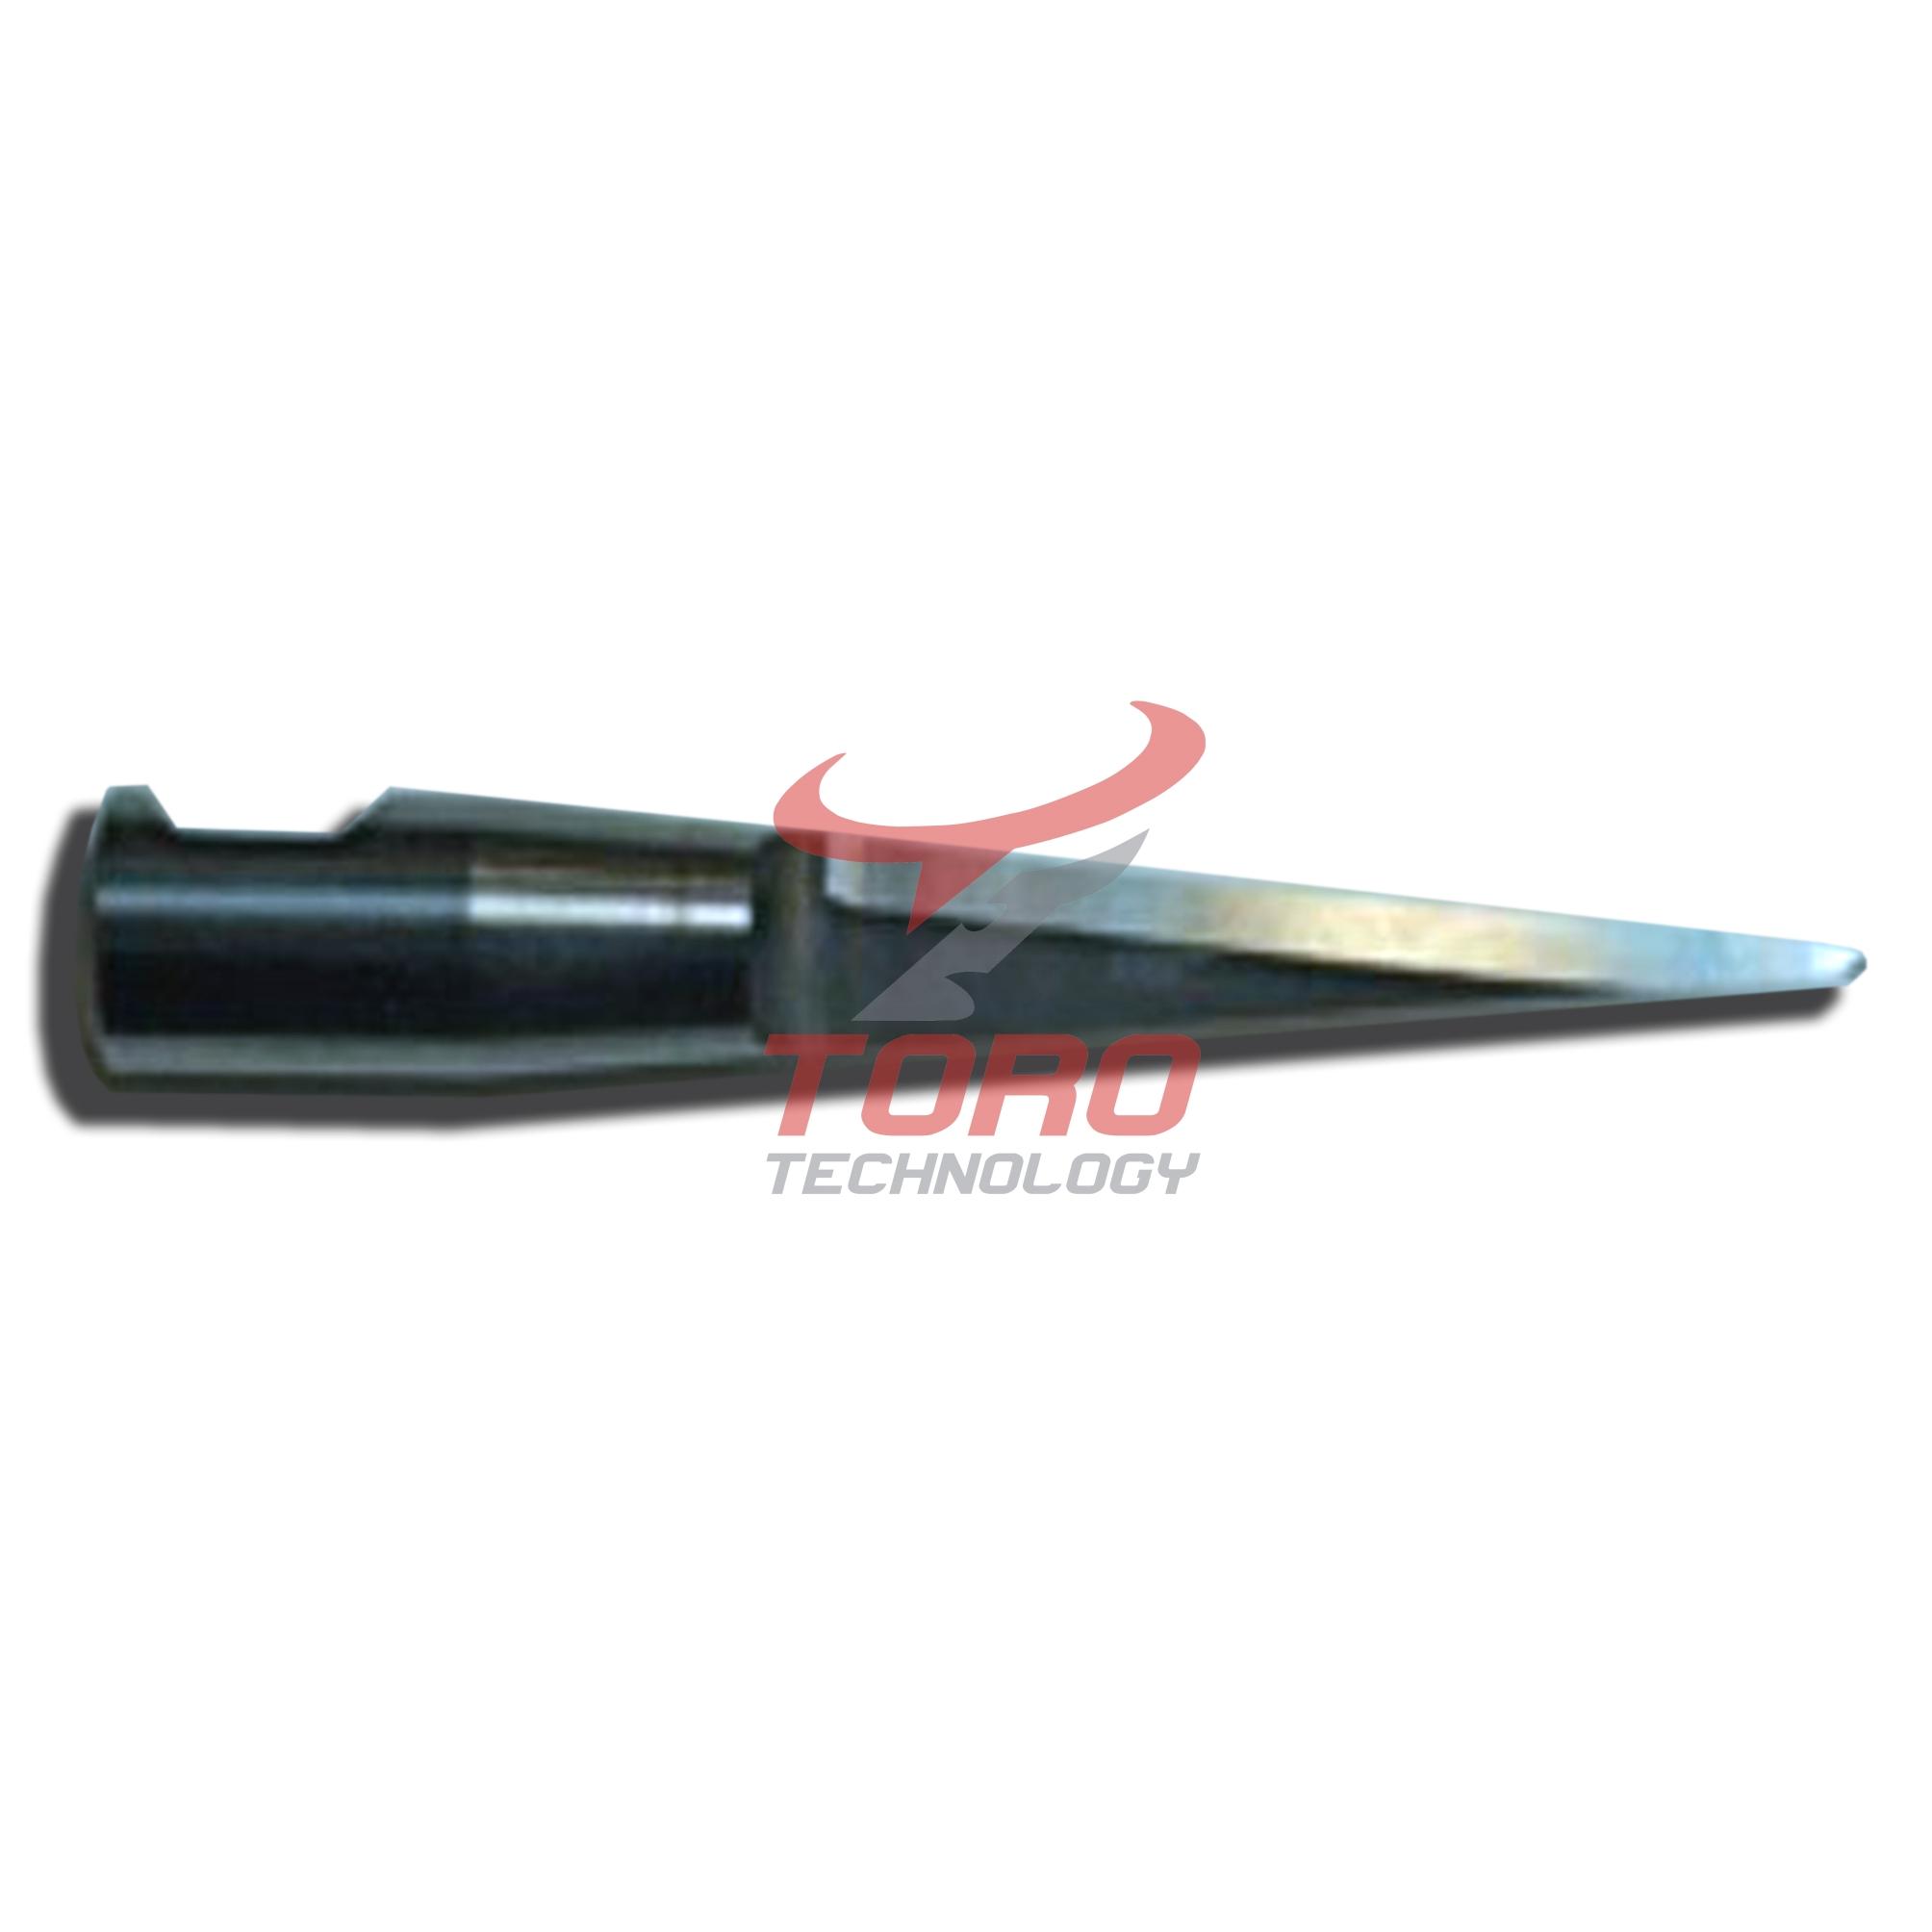 Nóż ostrze Aristo 000007354 7354 07354